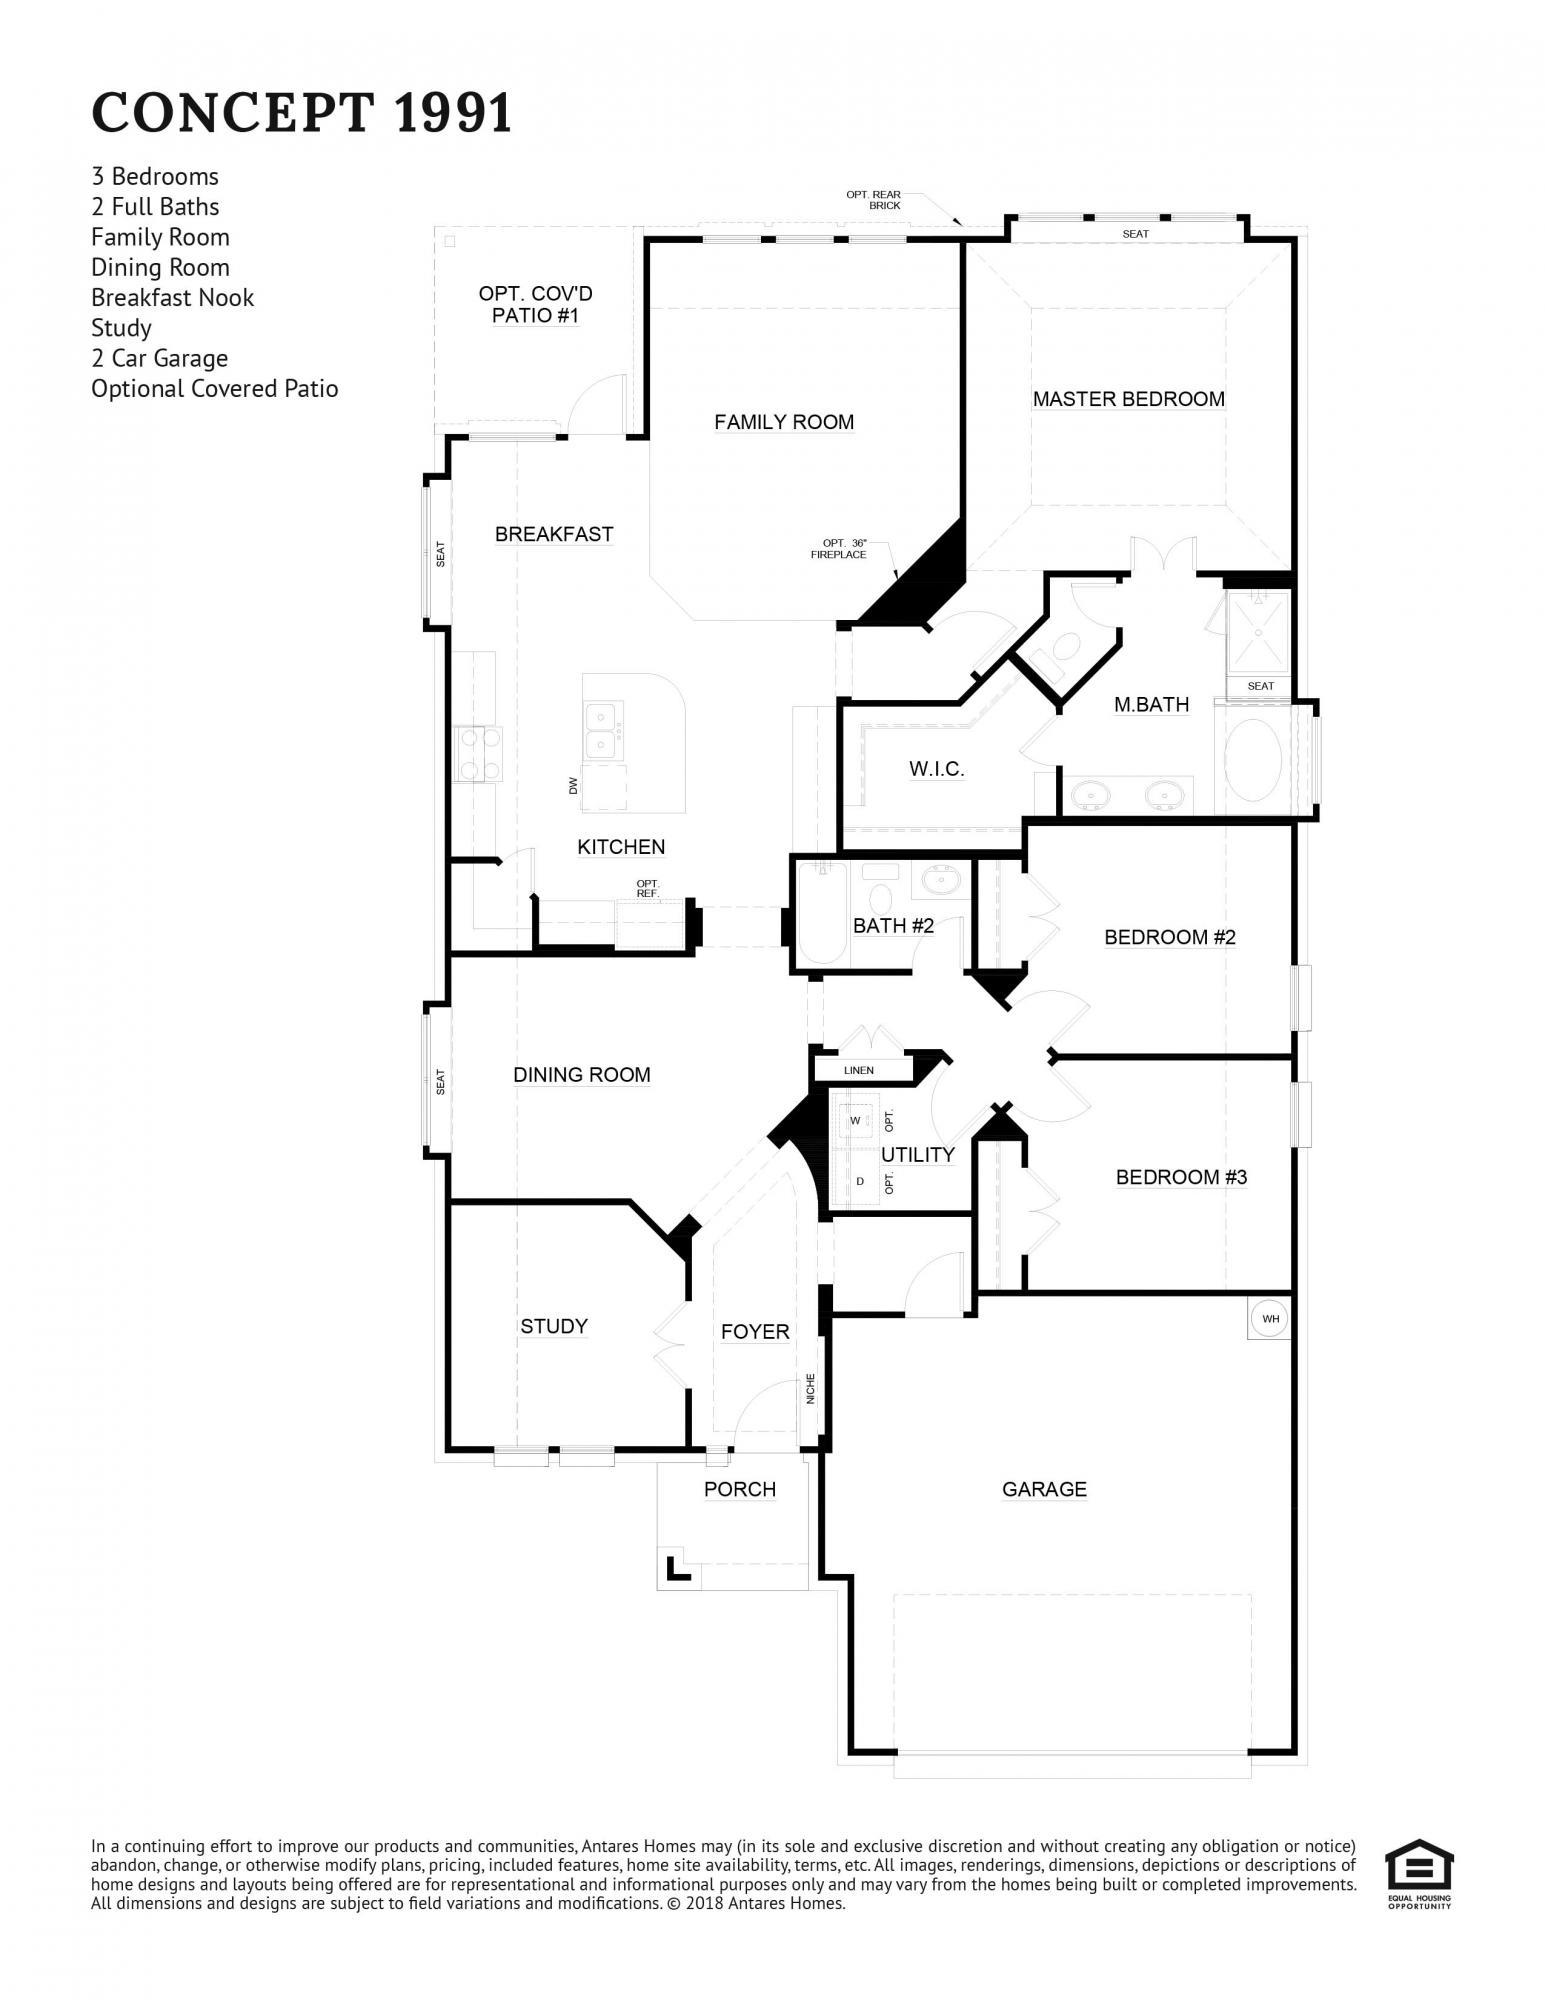 Concept 1991 Floorplan